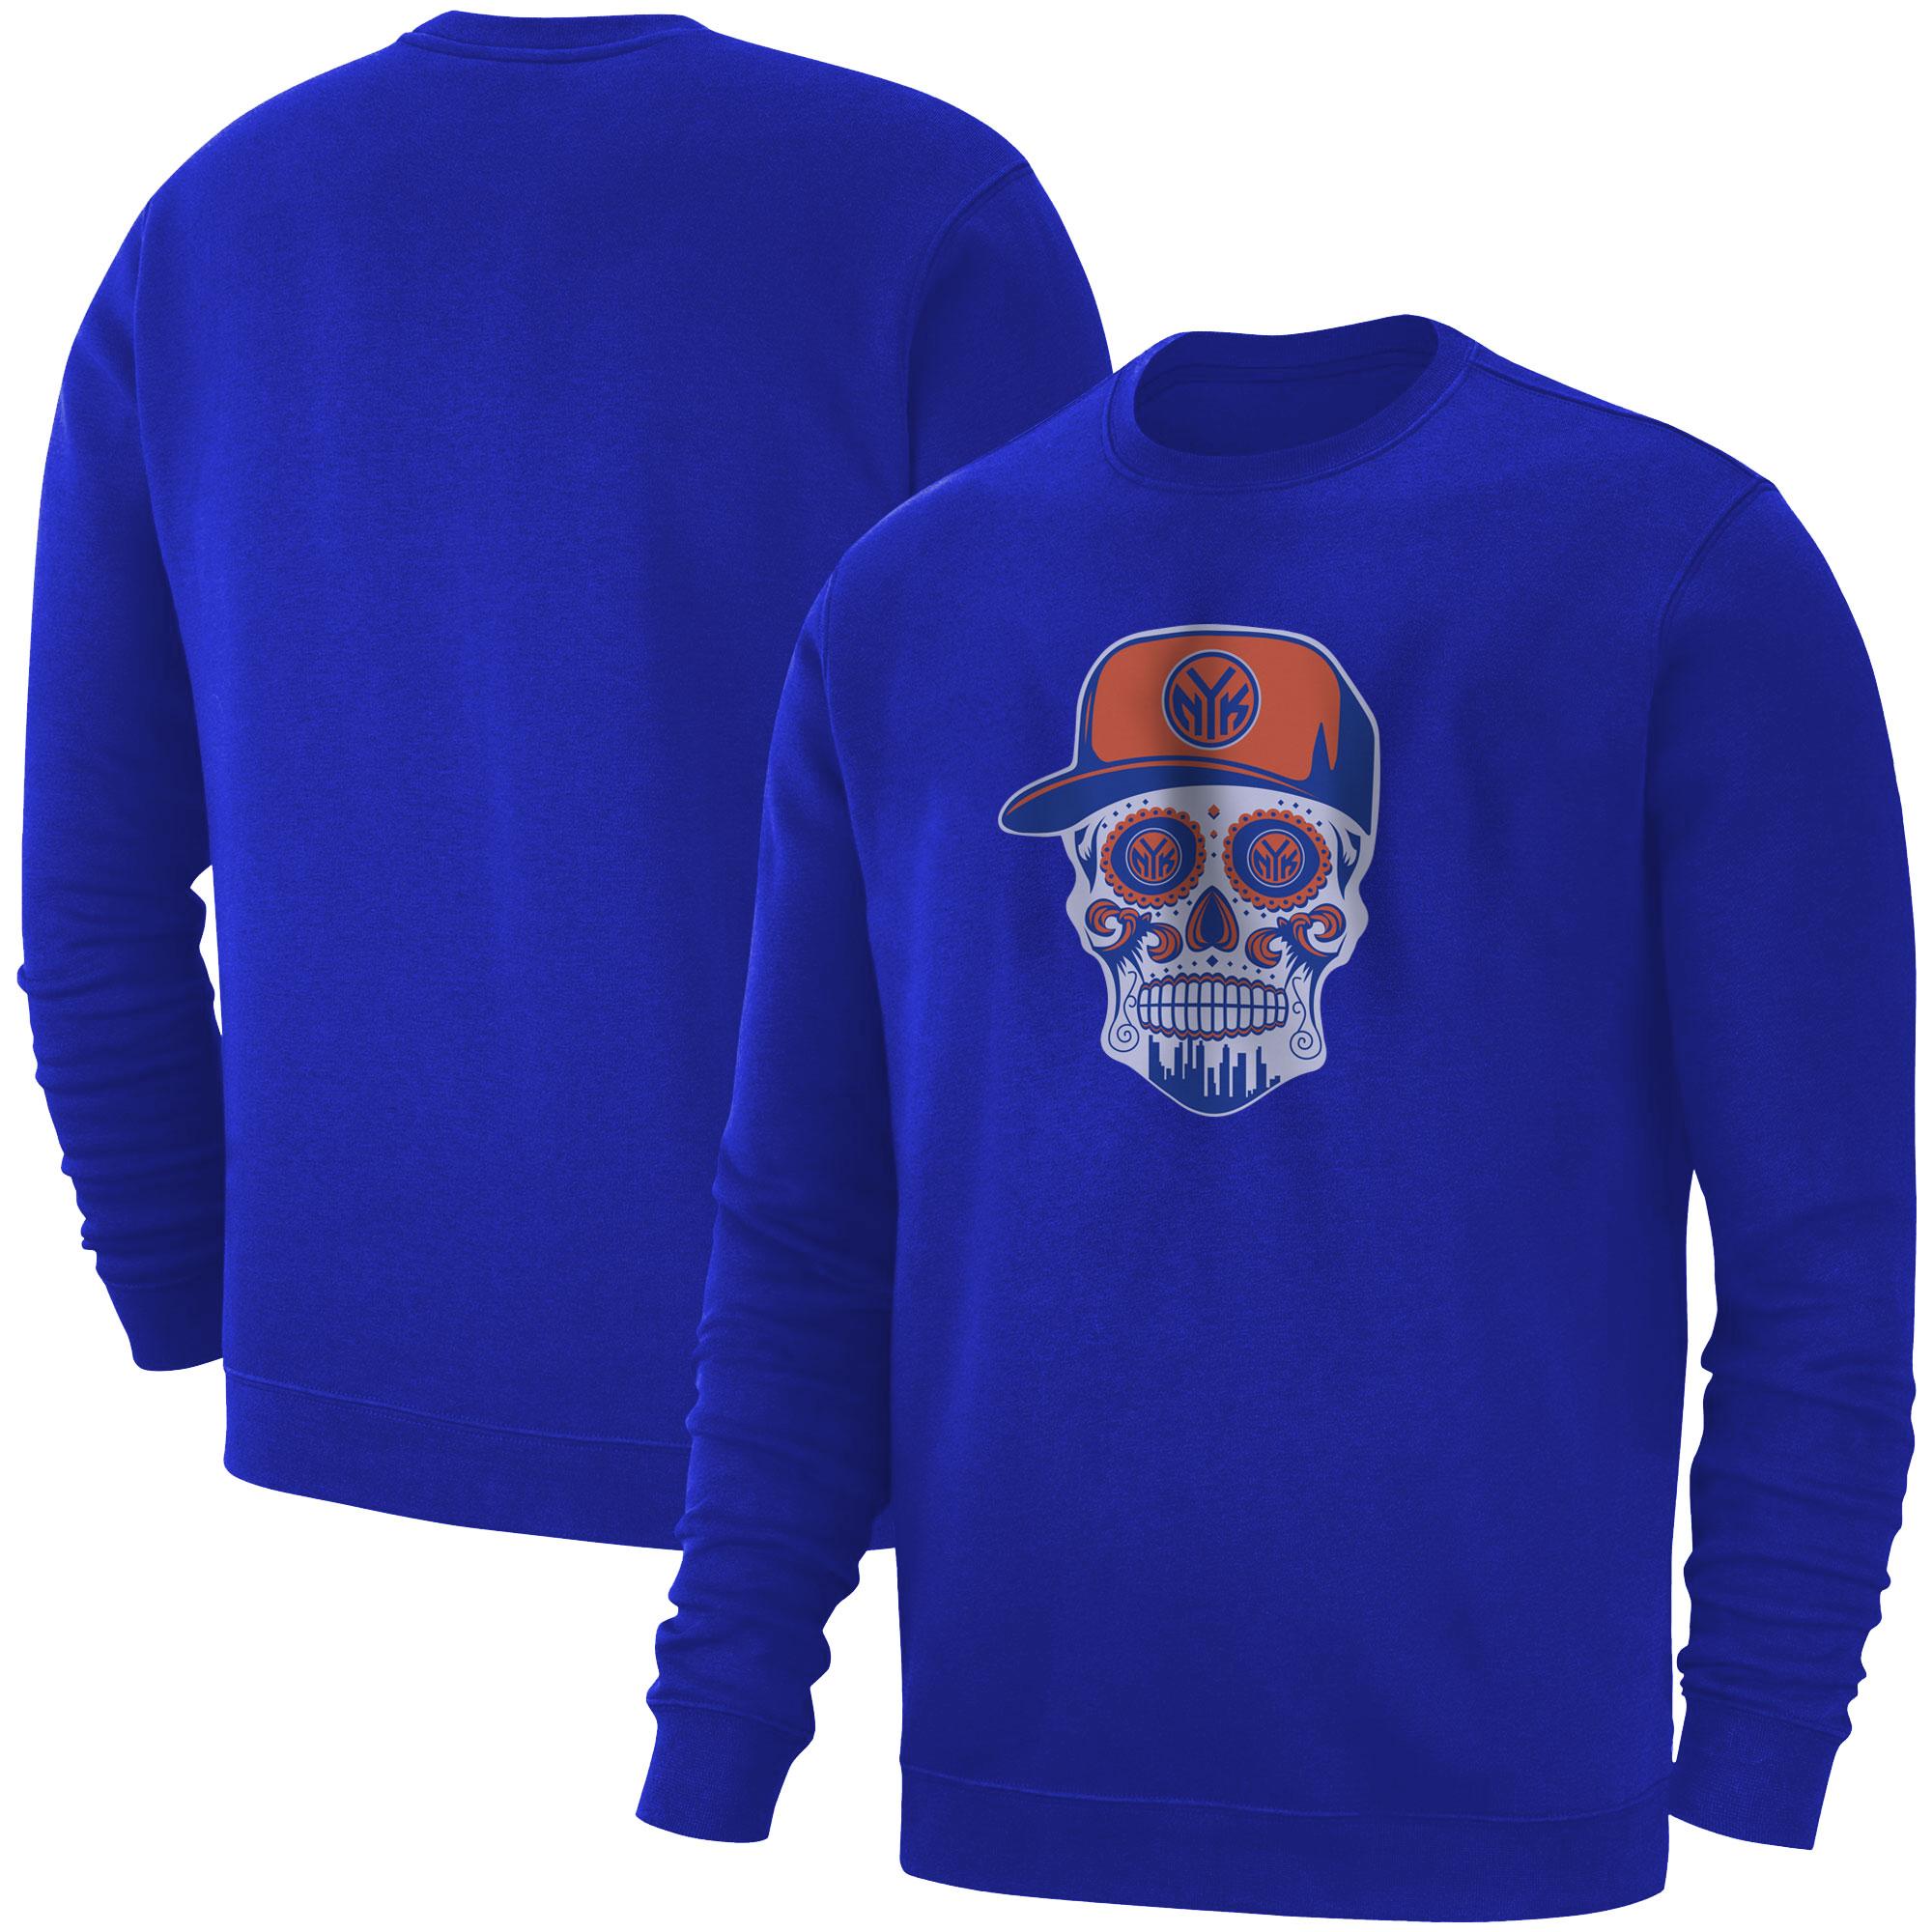 Knicks Skull  Basic (BSC-BLU-NP-458-NBA-NYK-SKULL)